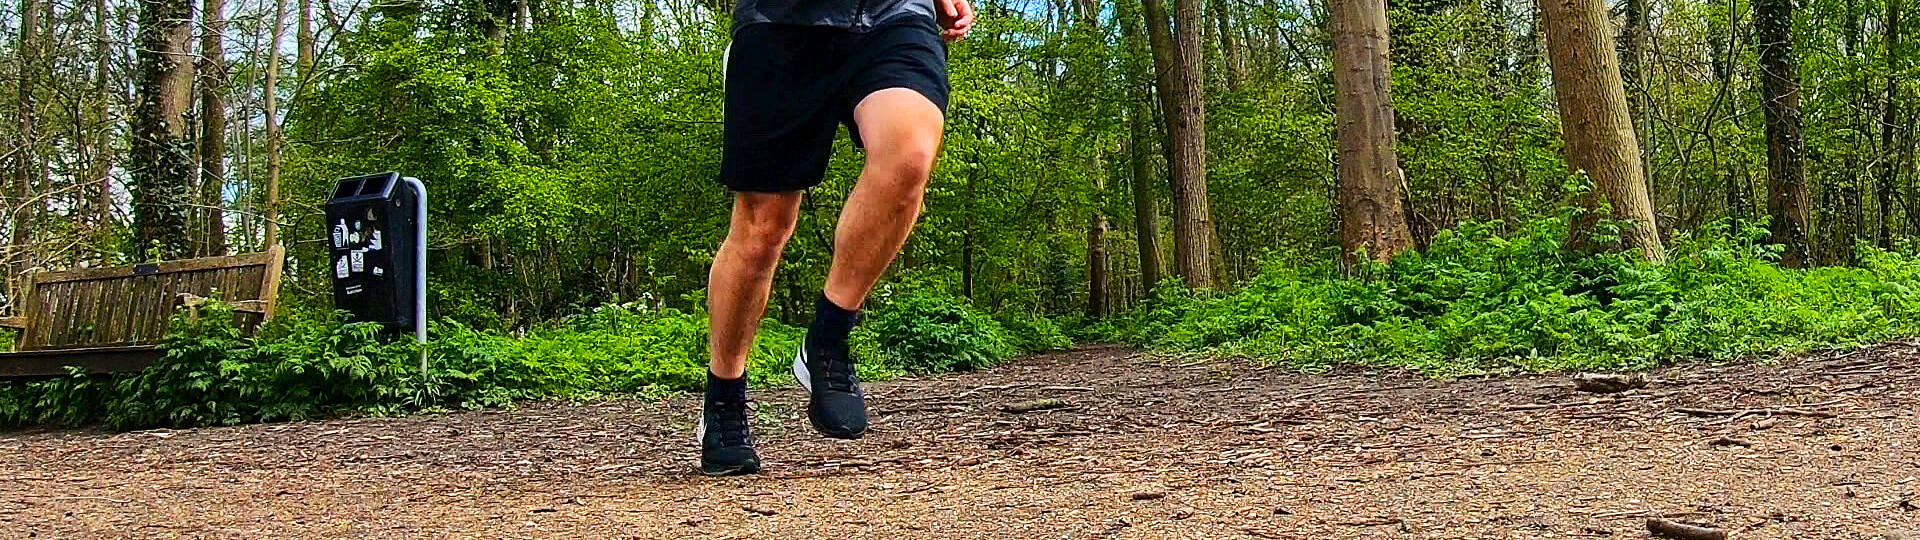 Trainingsschema 10 kilometer in 50 minuten